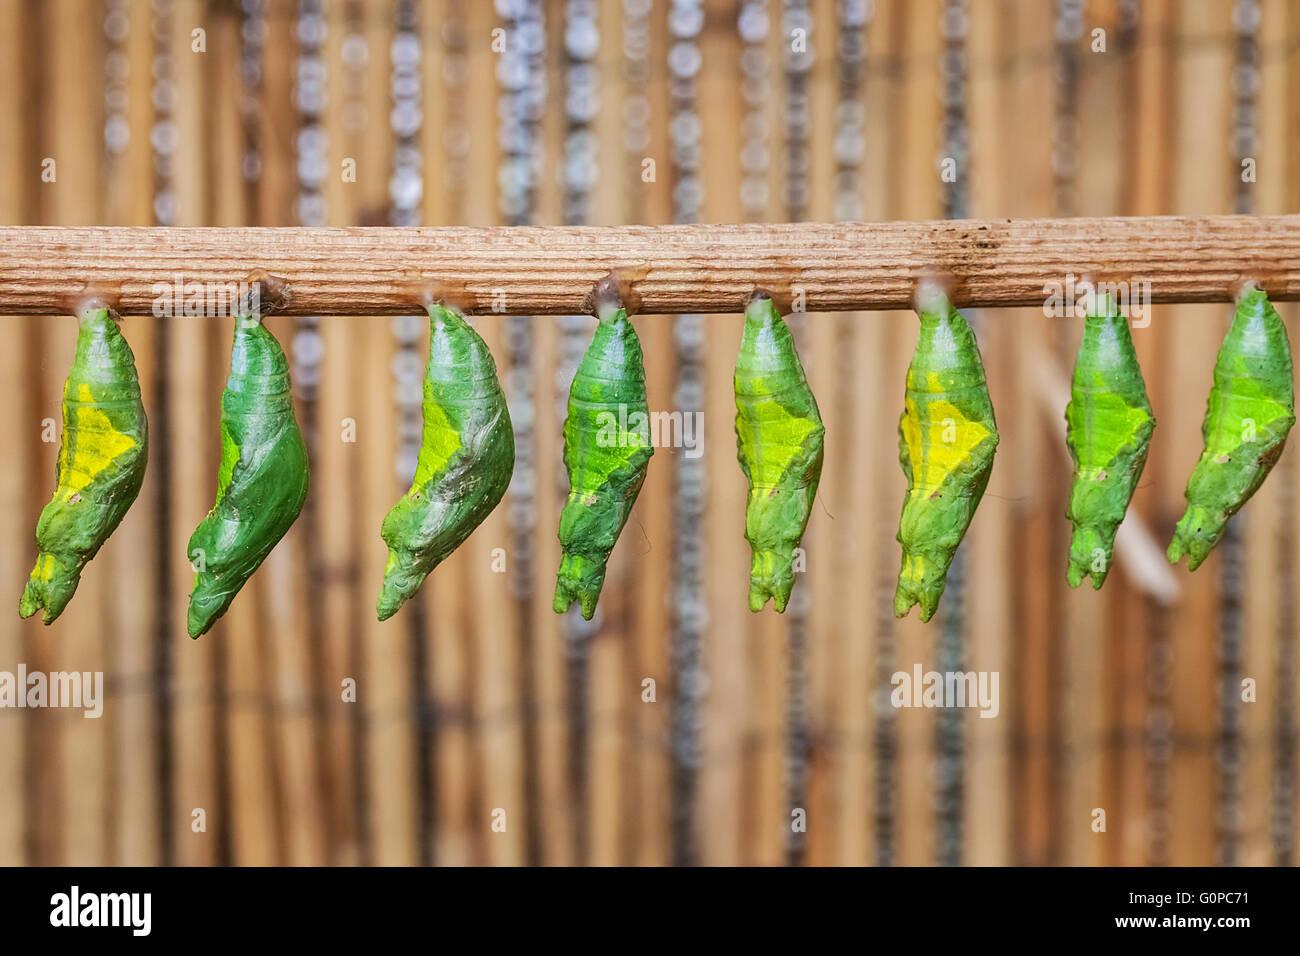 Monacrch batterfly chrysalis - Stock Image